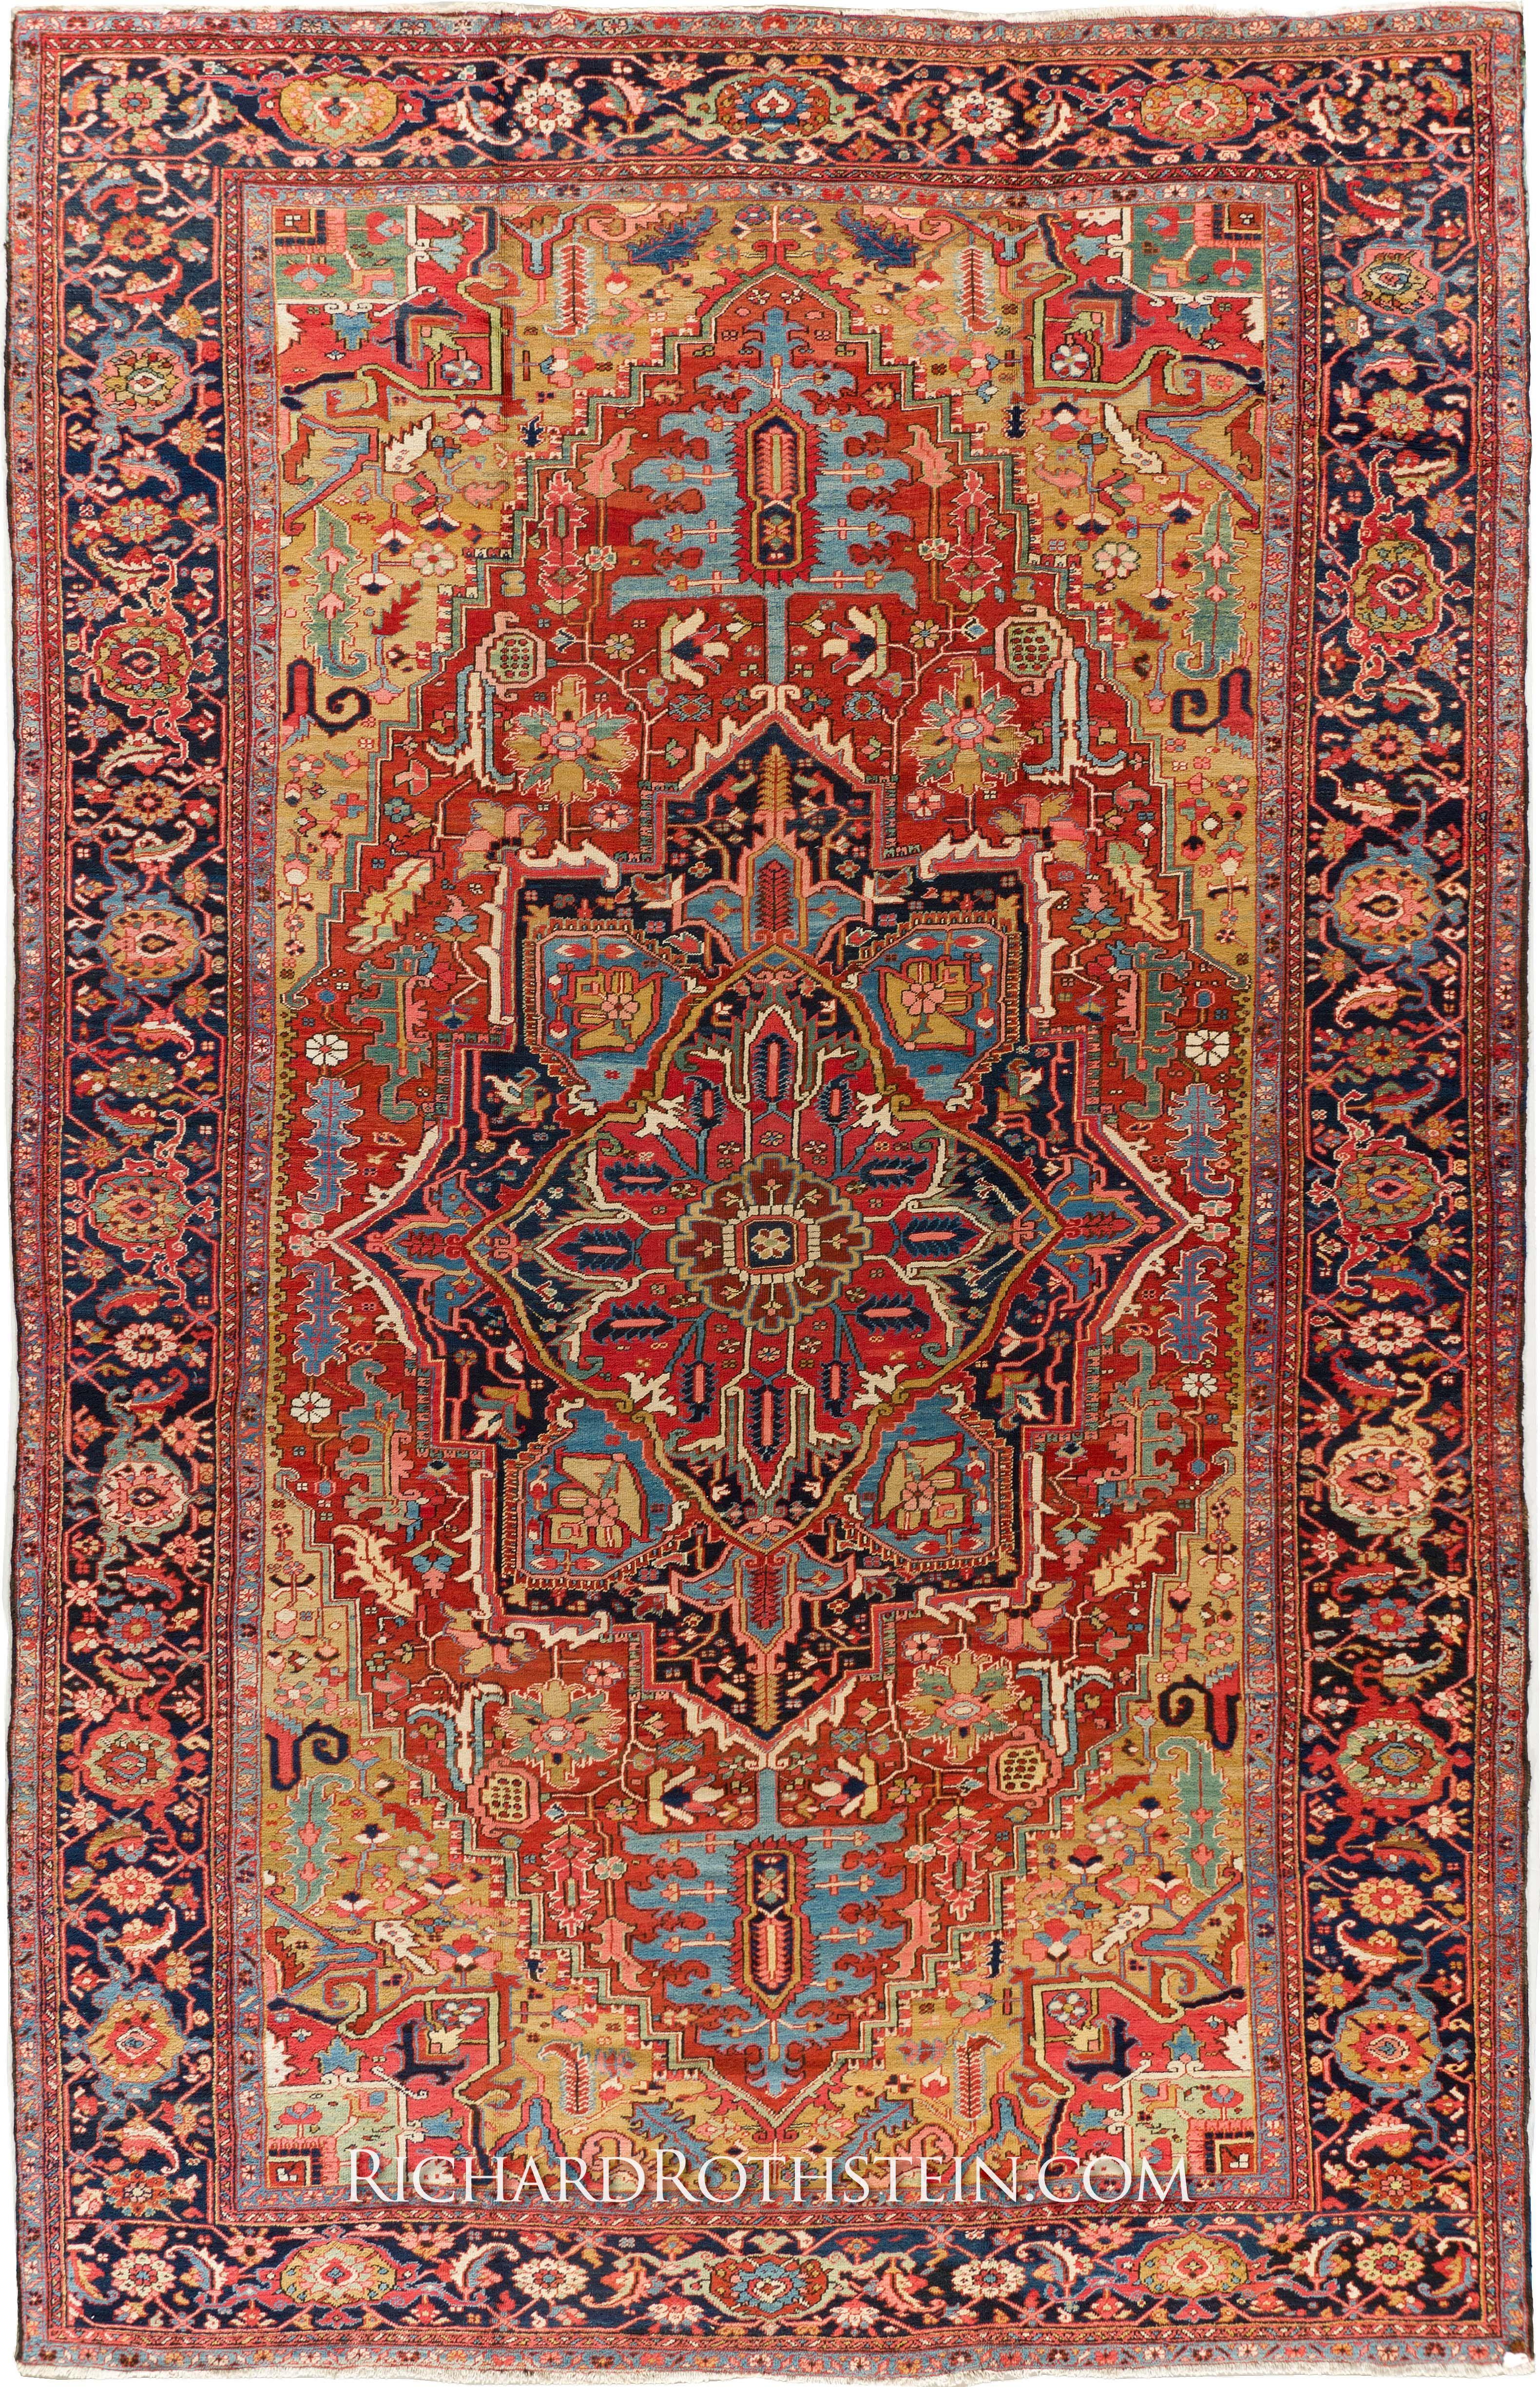 Polonaise antique oriental rugs - Museum Heriz Antique Oriental Rug C55d6961